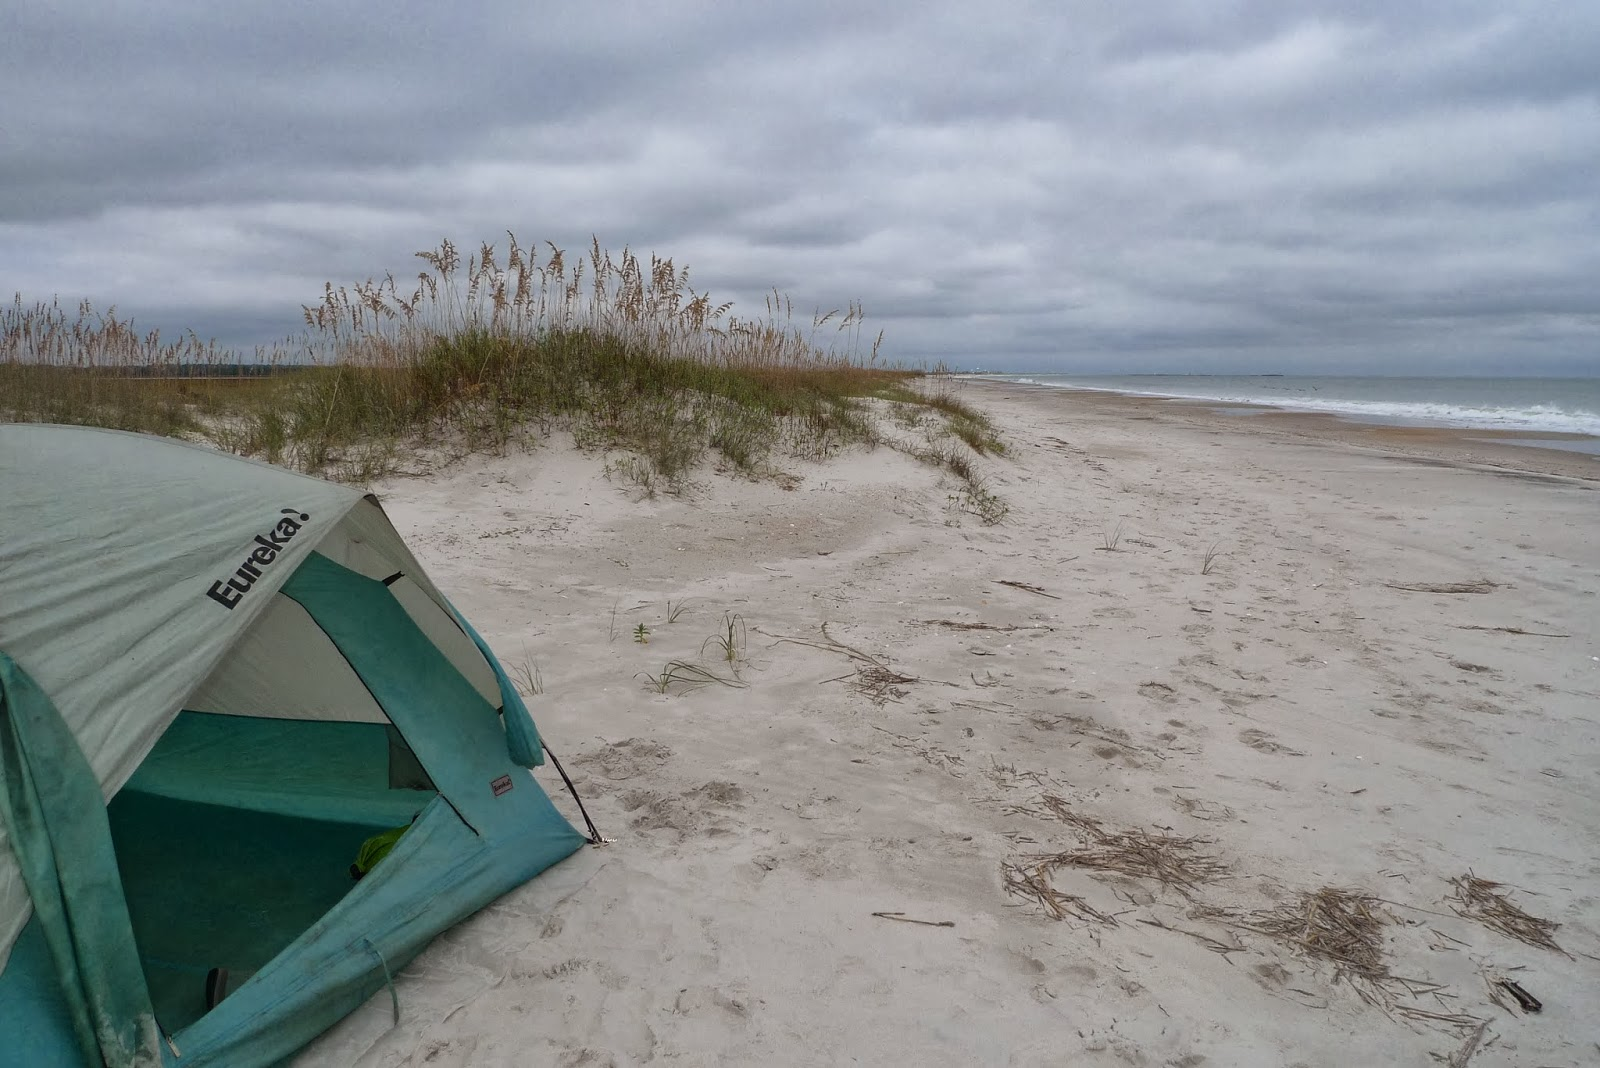 Christine Hennessey: Camping at Masonboro Island